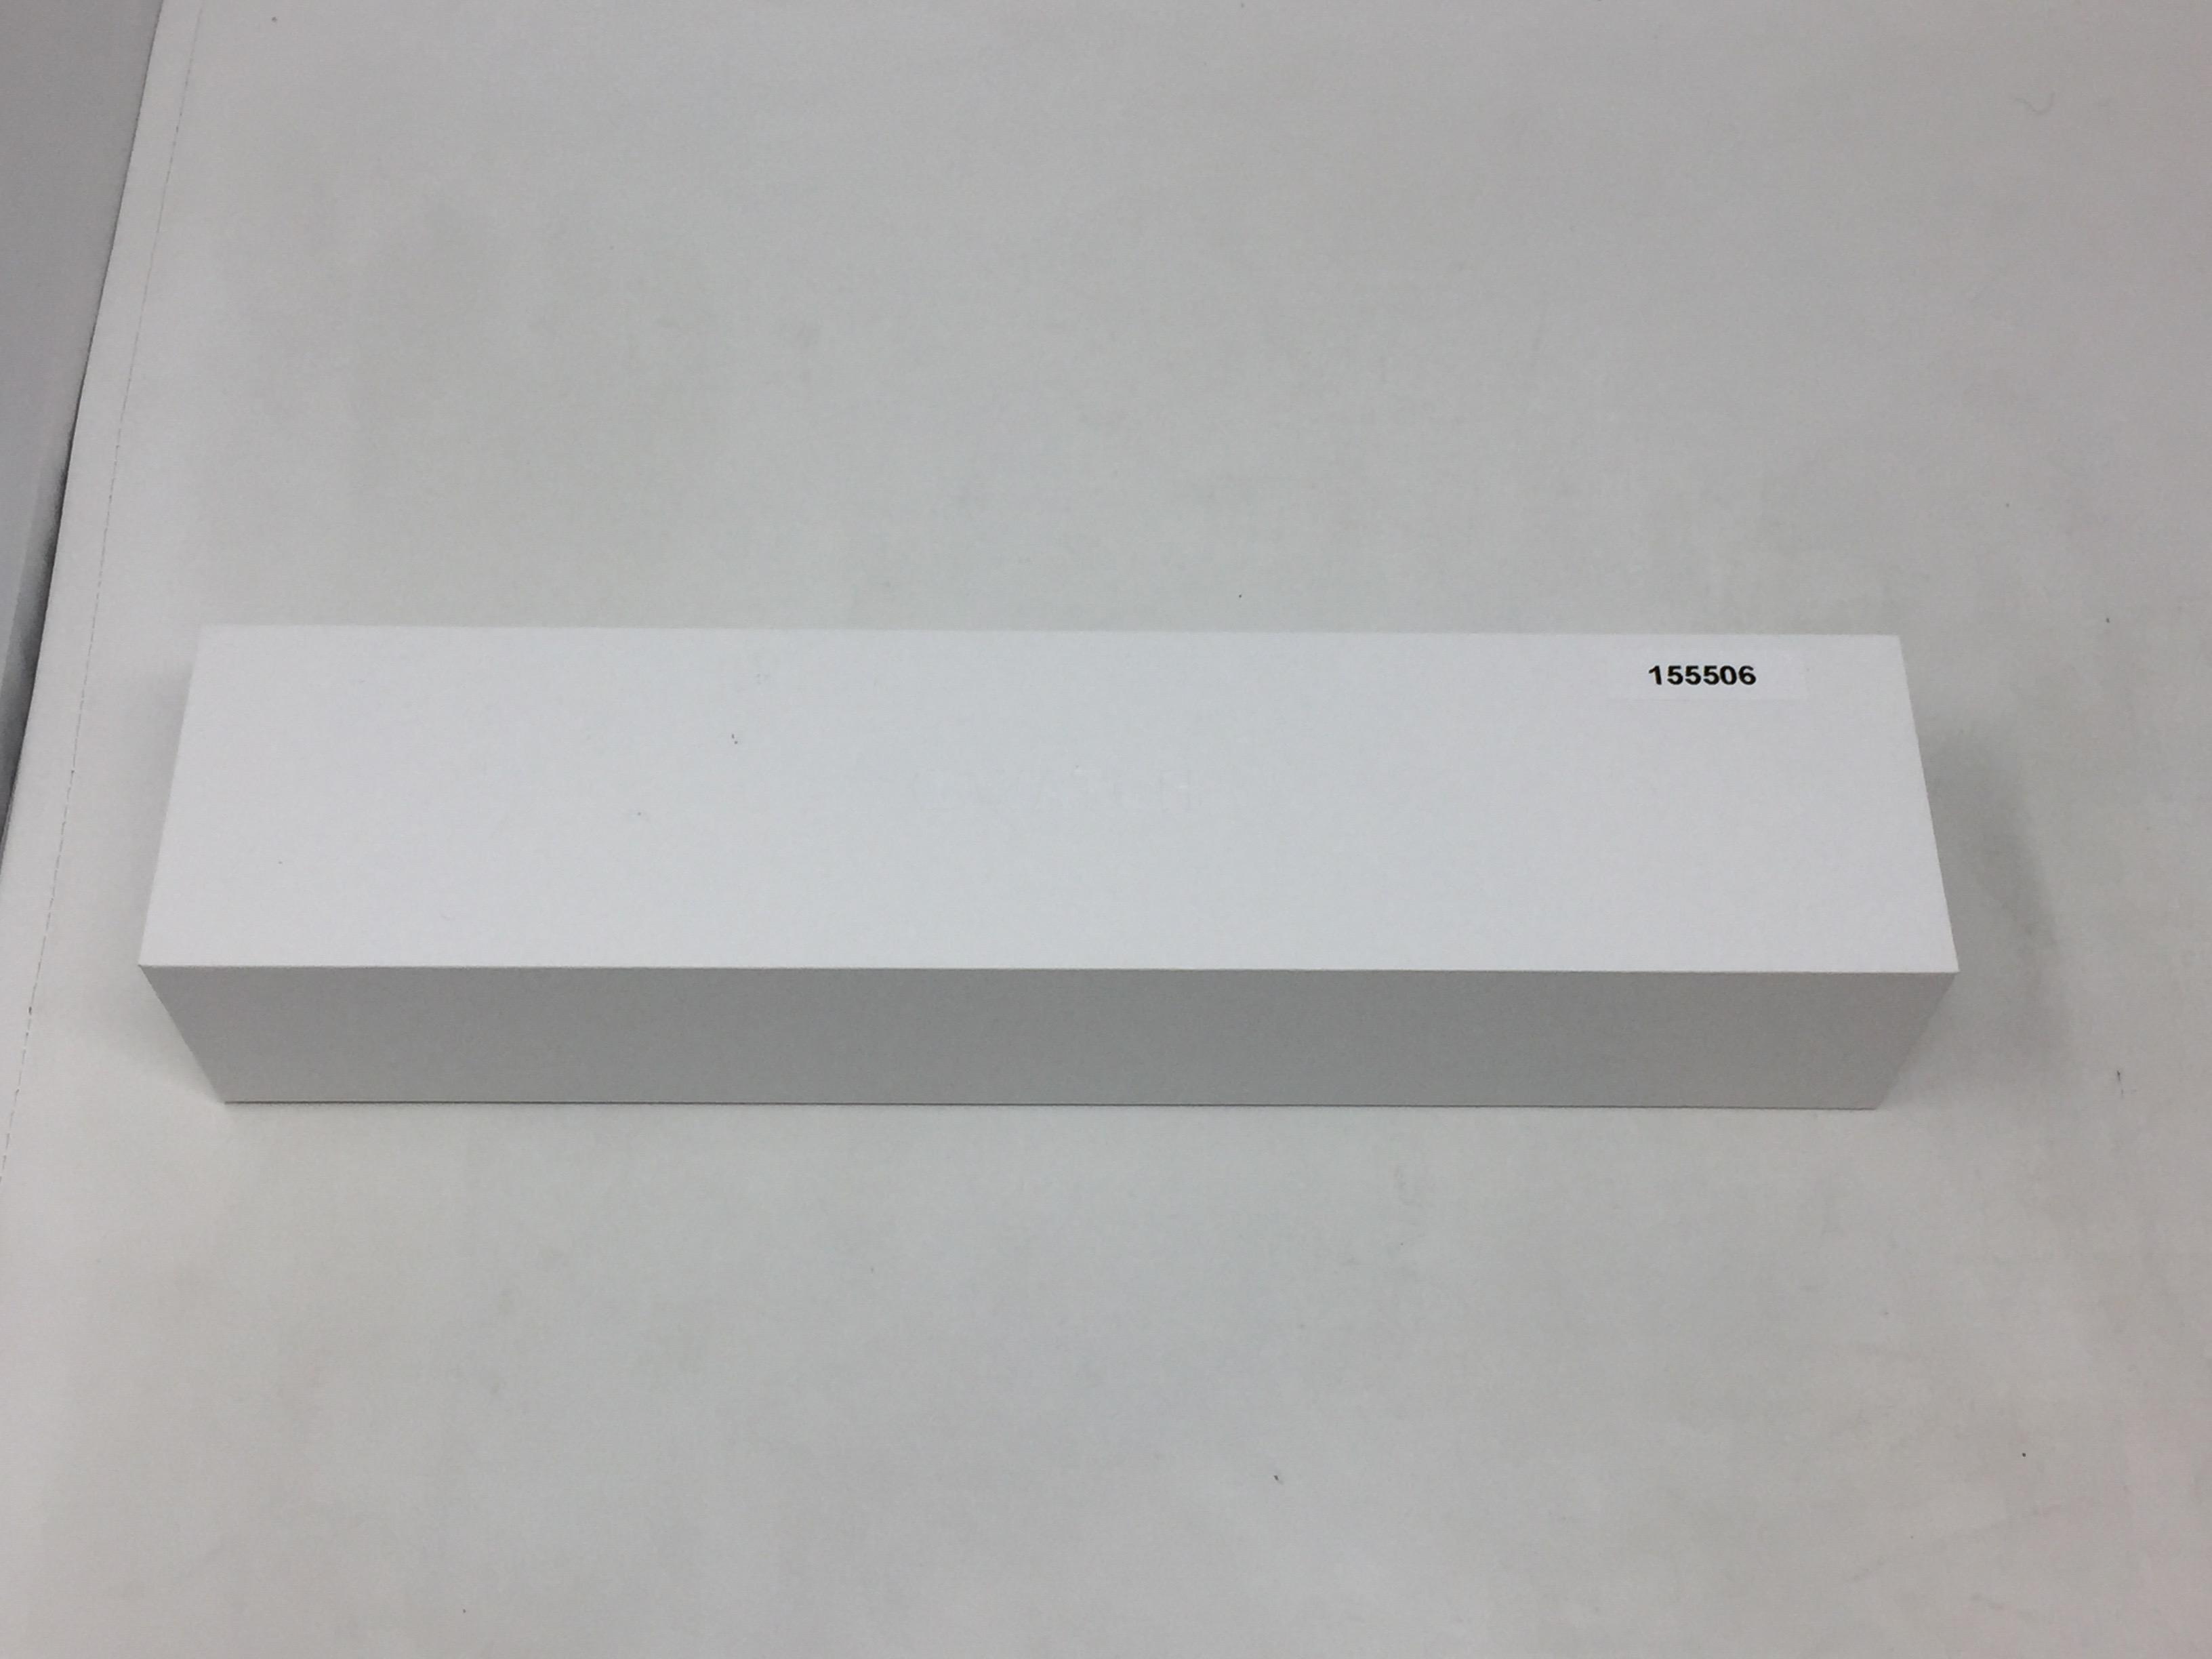 Watch Series 2 Aluminum (42mm), imagen 5